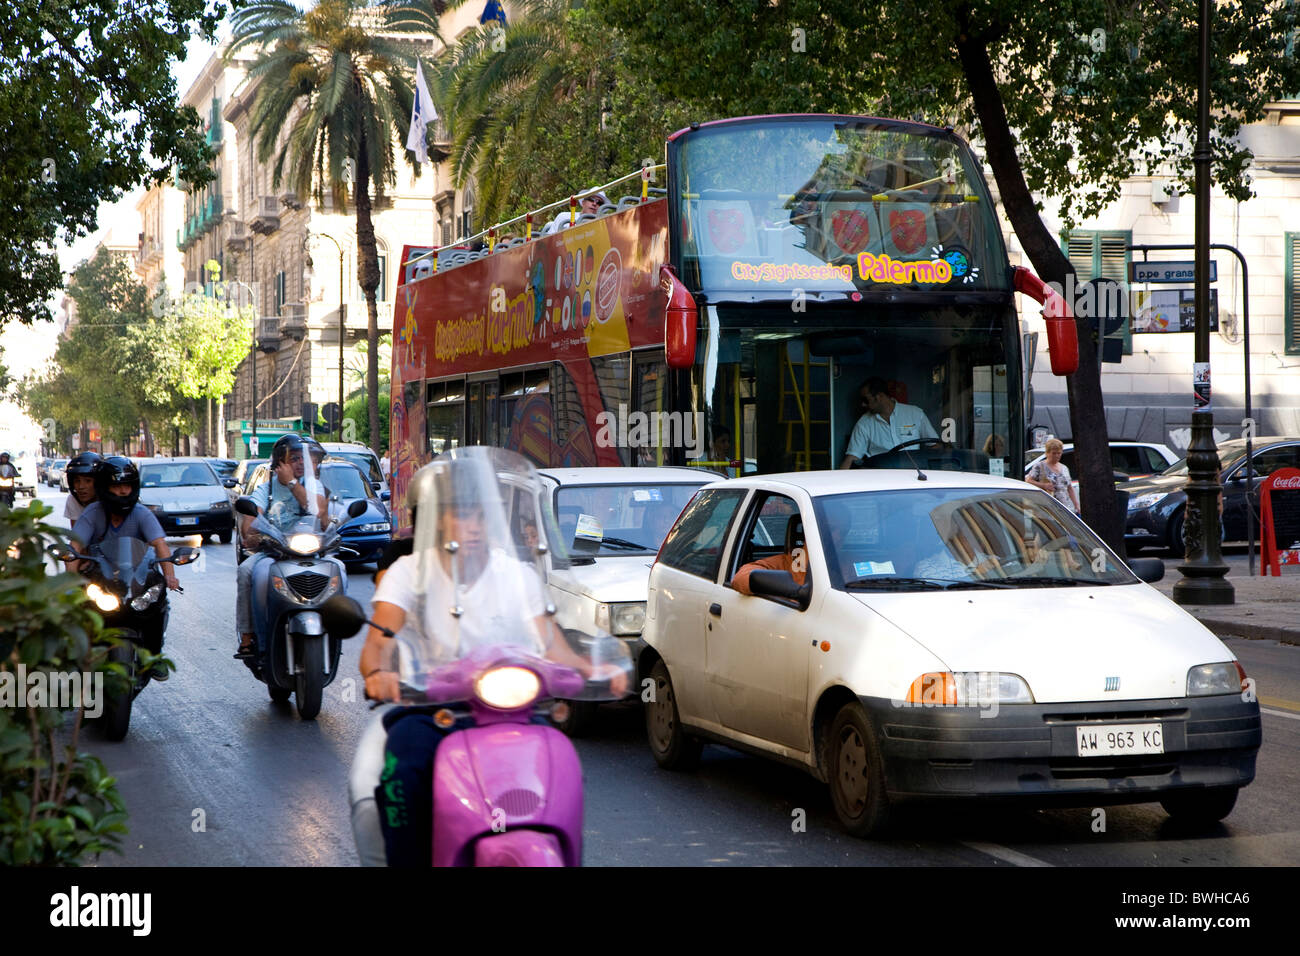 Sightseeing bus, tourist bus, traffic, palm trees, Palermo, Sicily, Italy, Europe Stock Photo